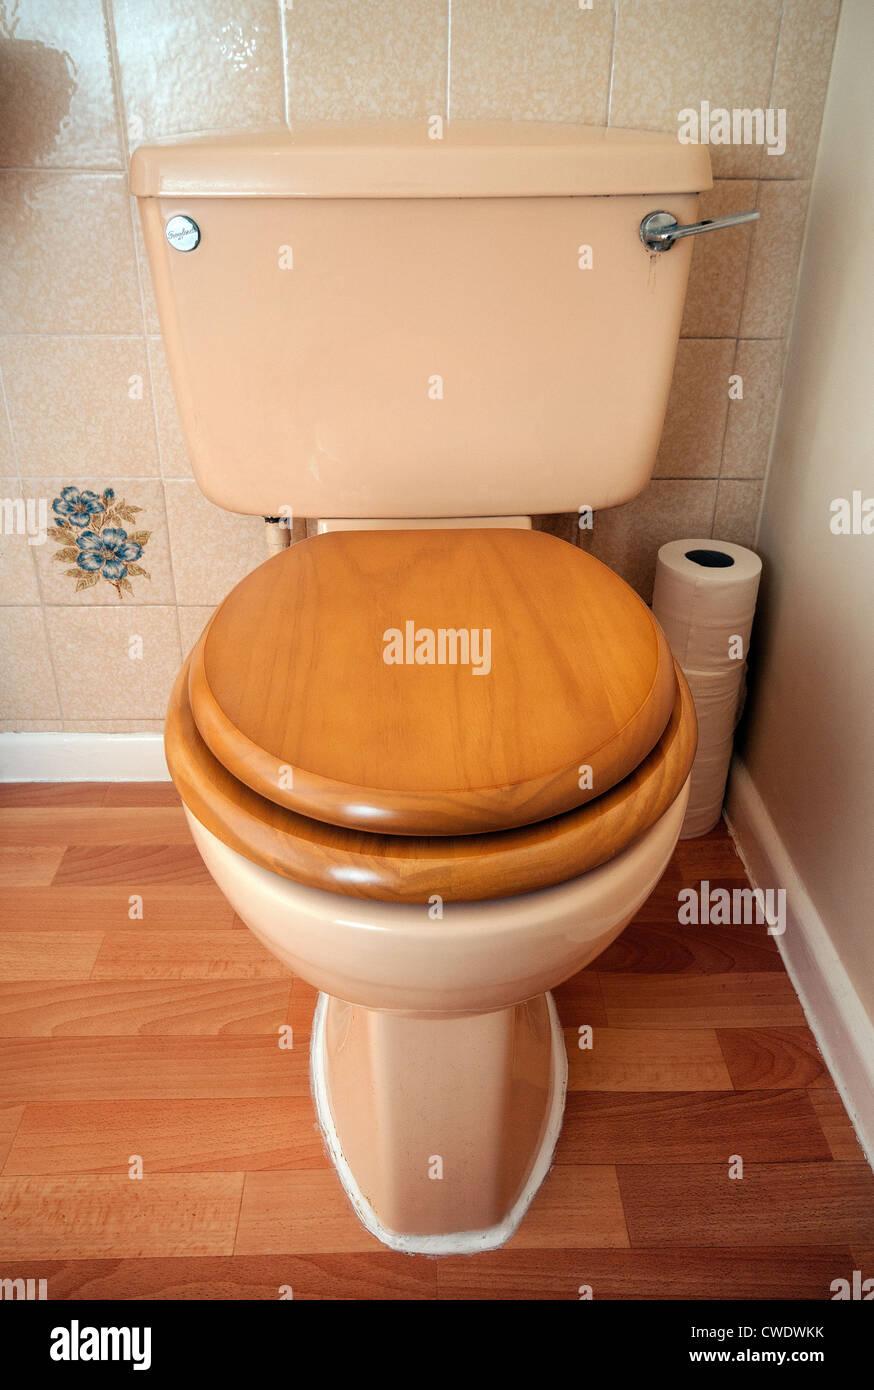 Eighties style toilet - Stock Image